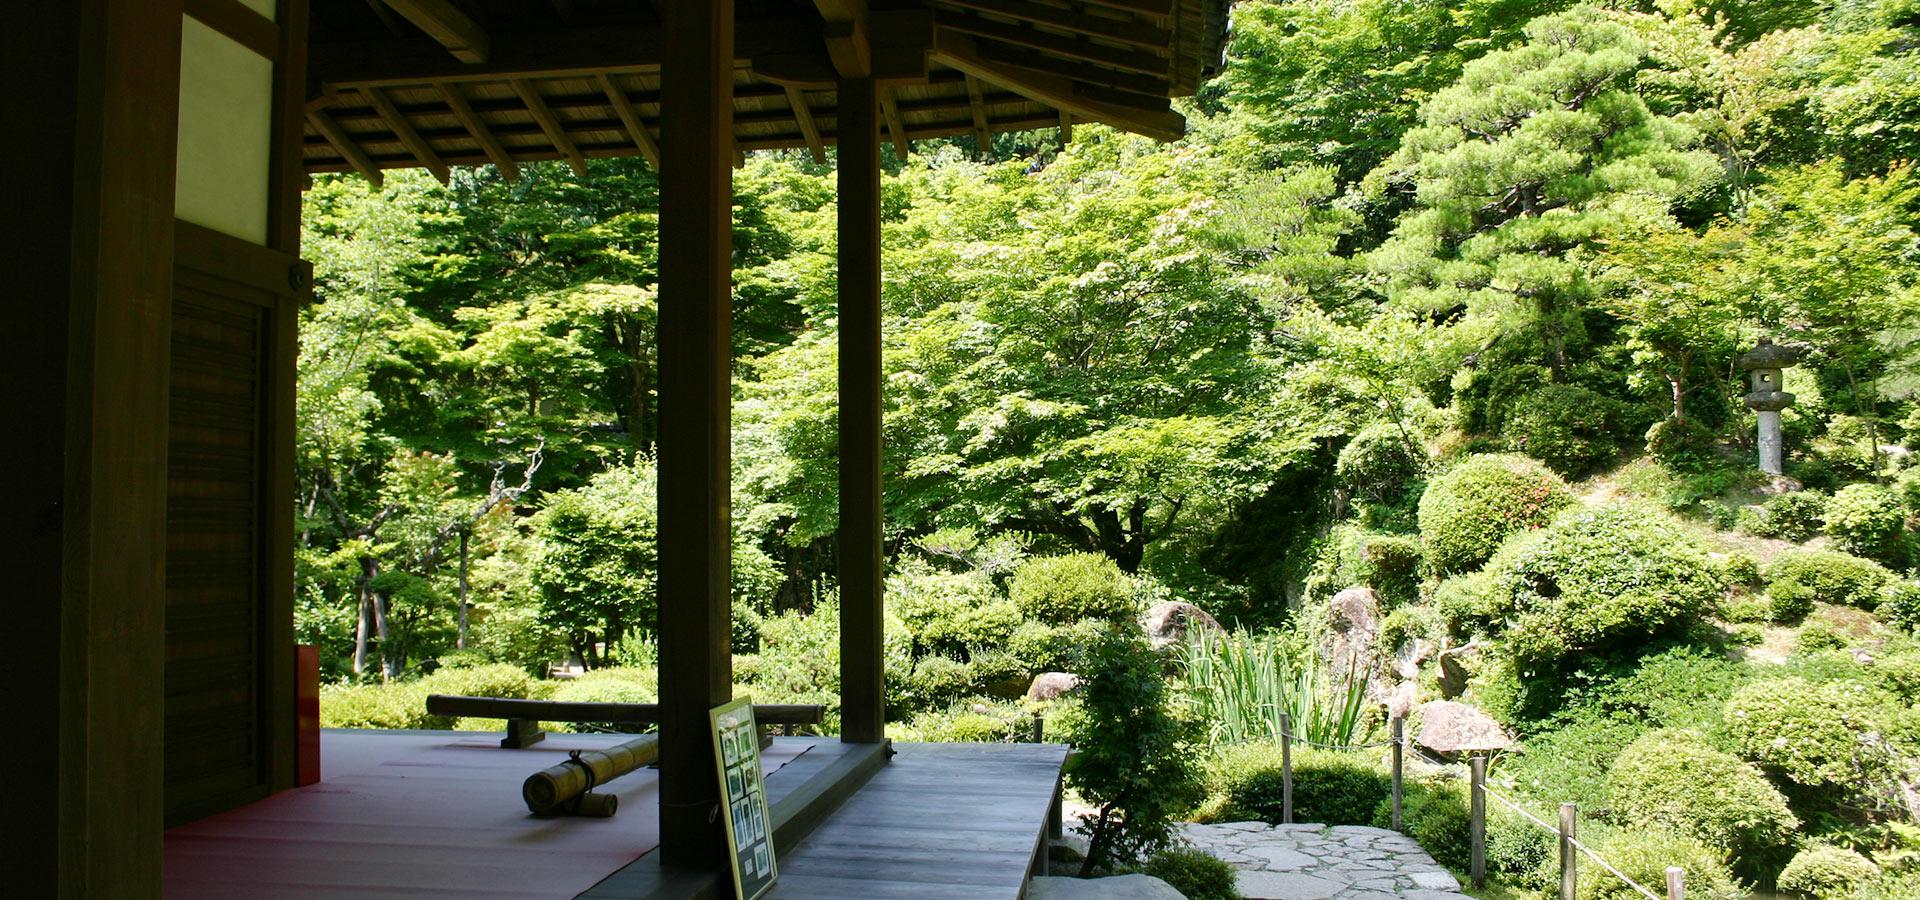 [Koto Sanzan] Kongorinji Temple